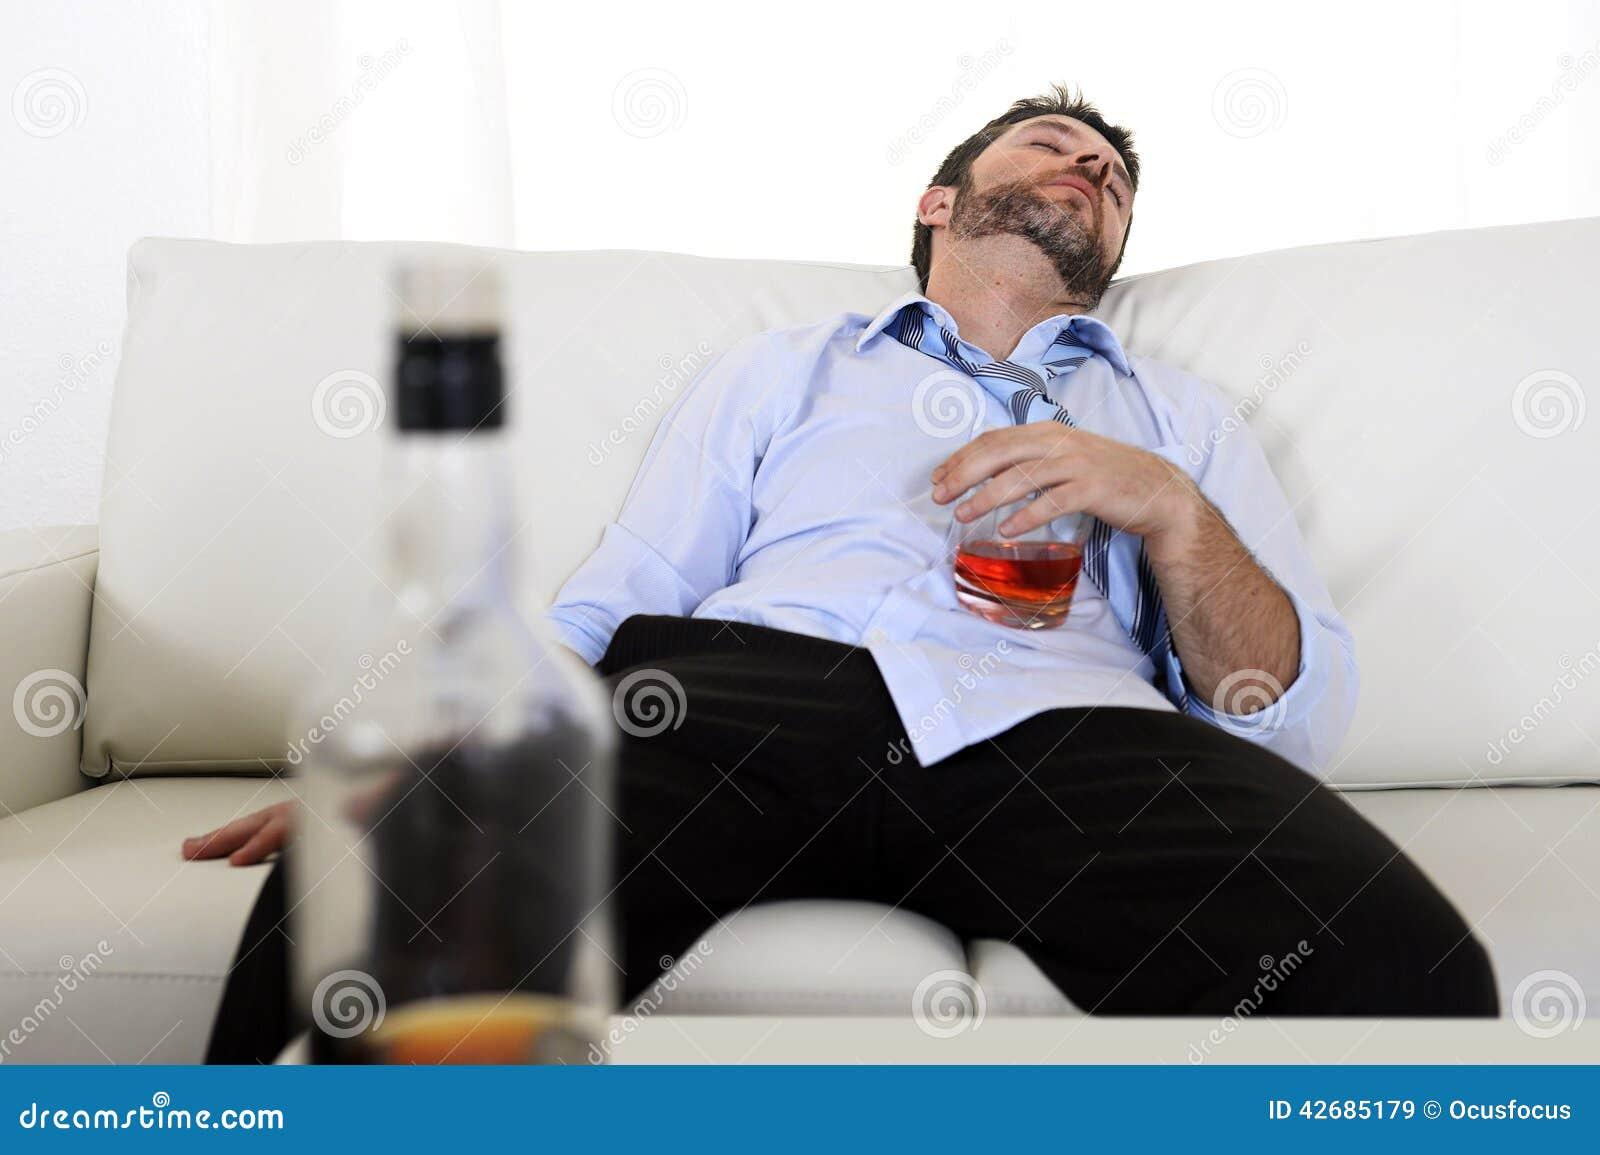 alcohol addiction lying